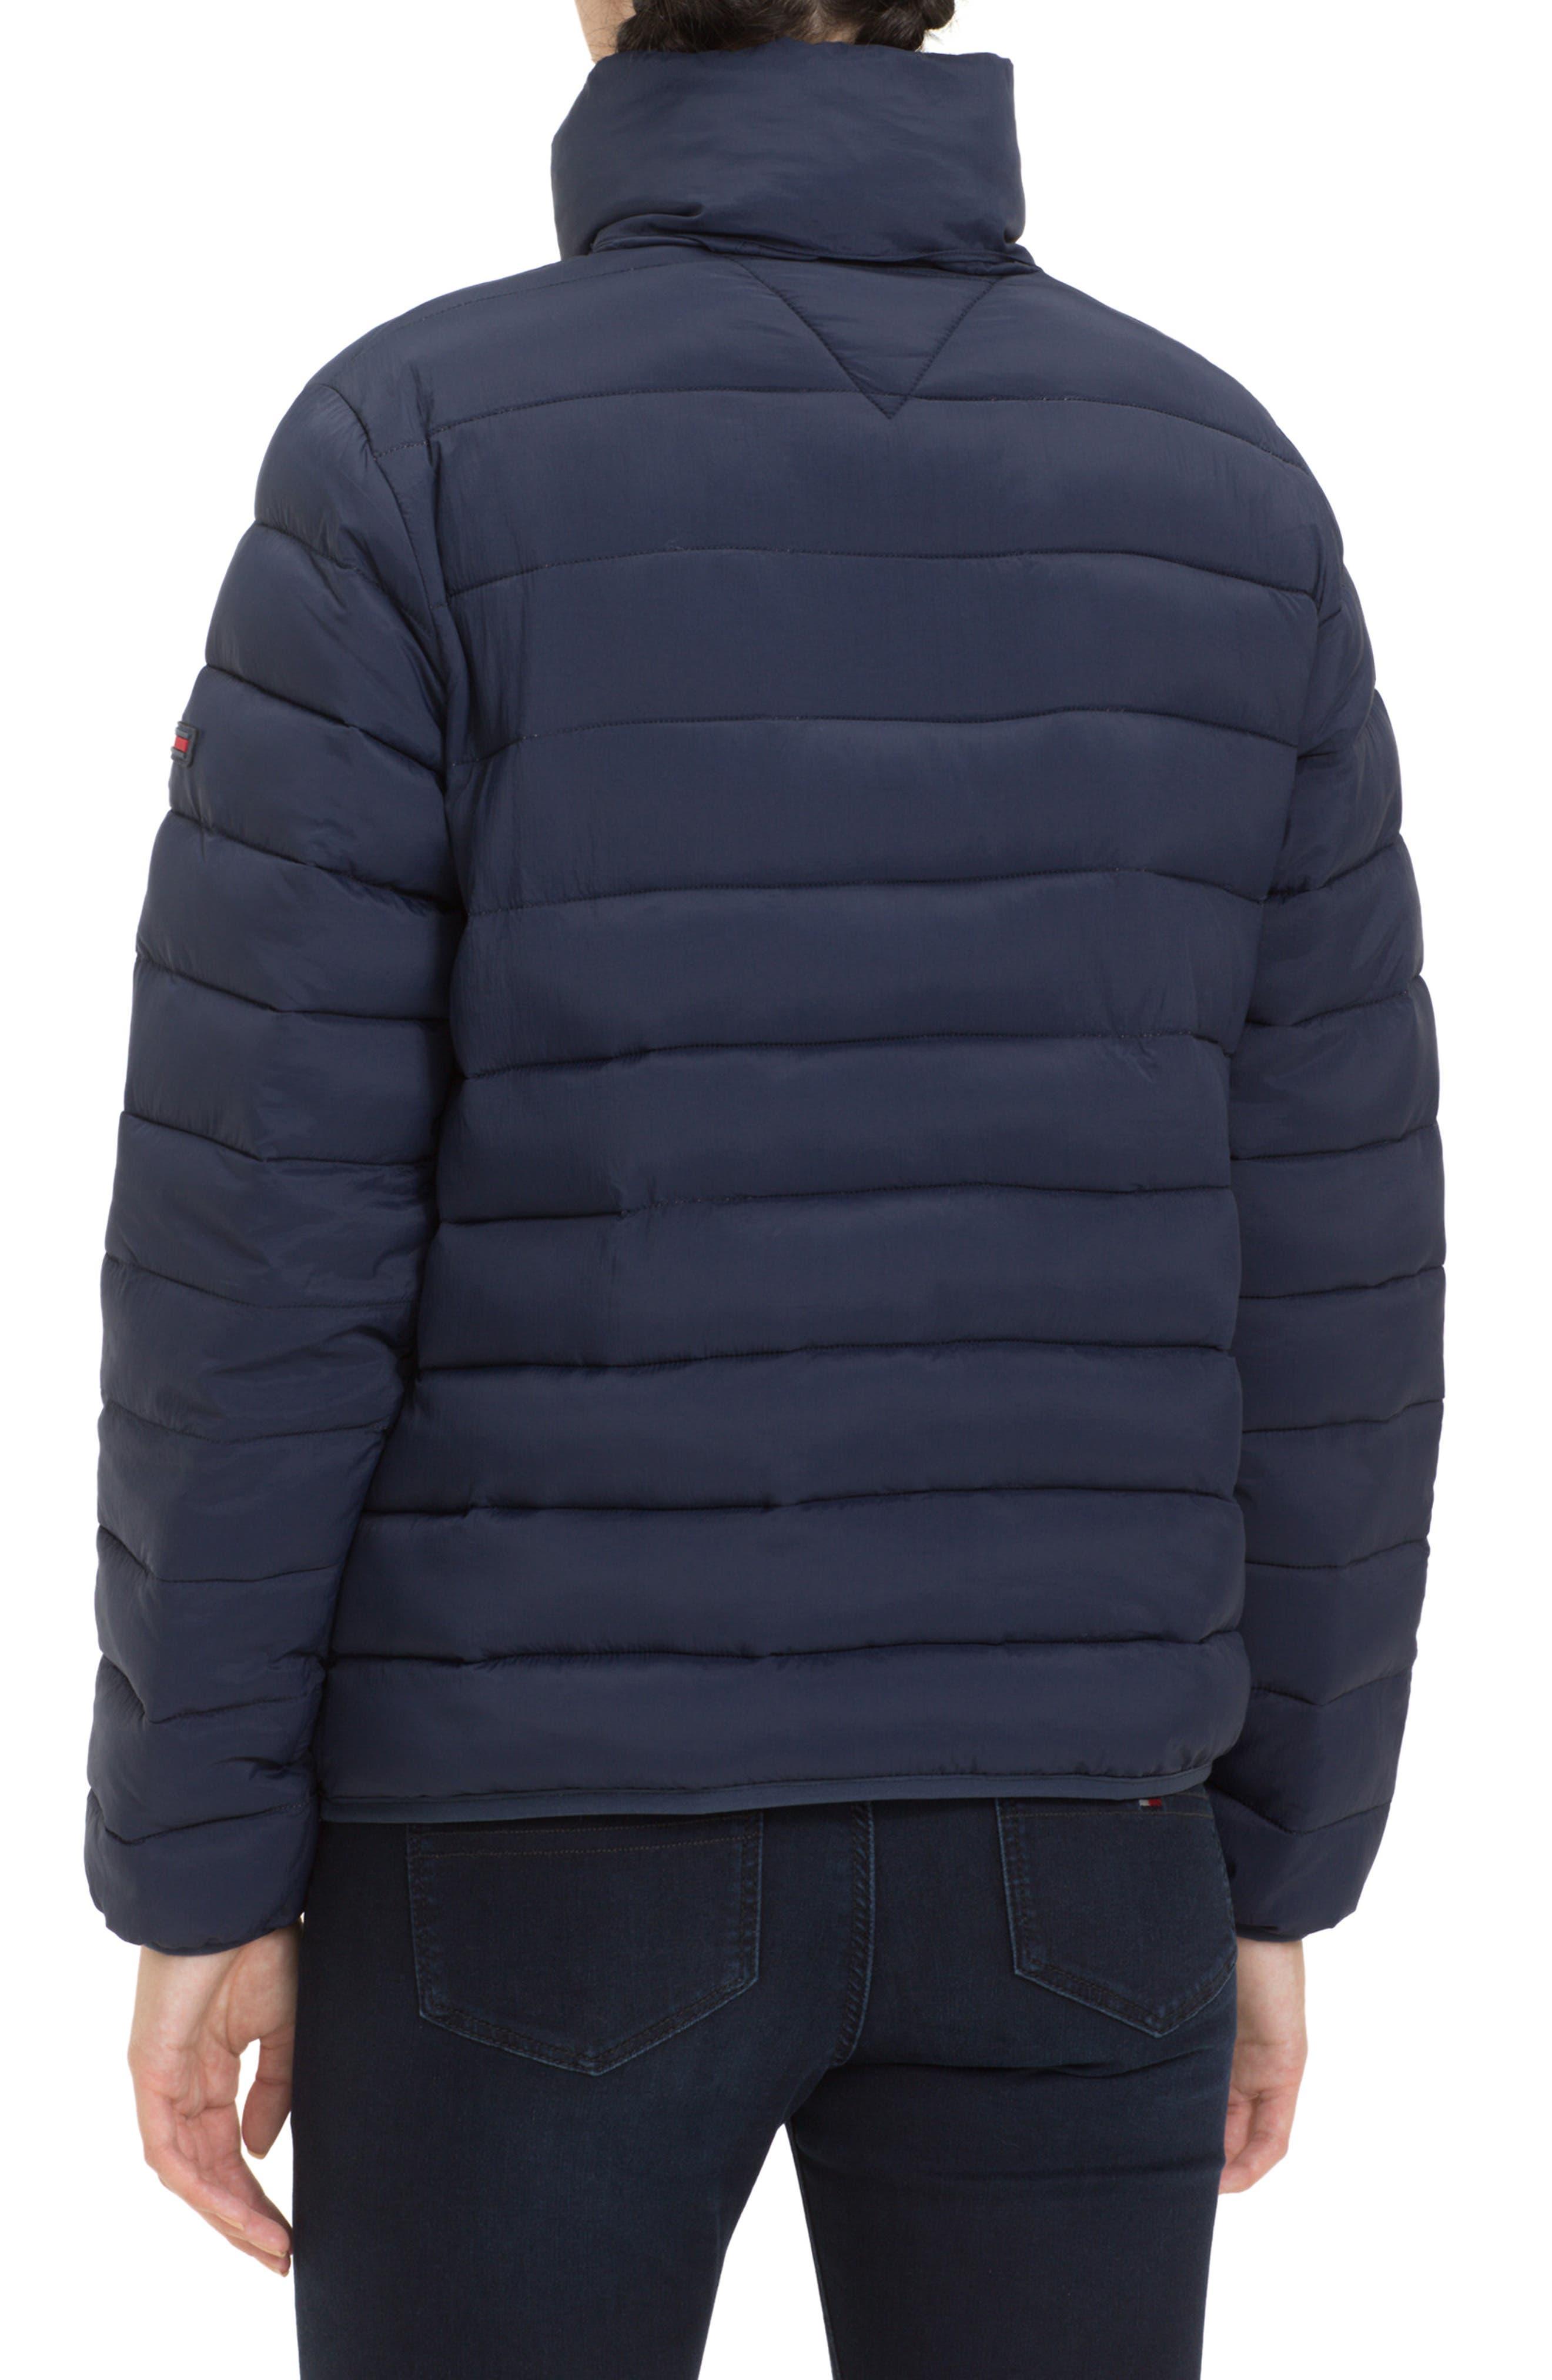 TJW Quilted Half-Zip Puffer Jacket,                             Alternate thumbnail 2, color,                             BLACK IRIS